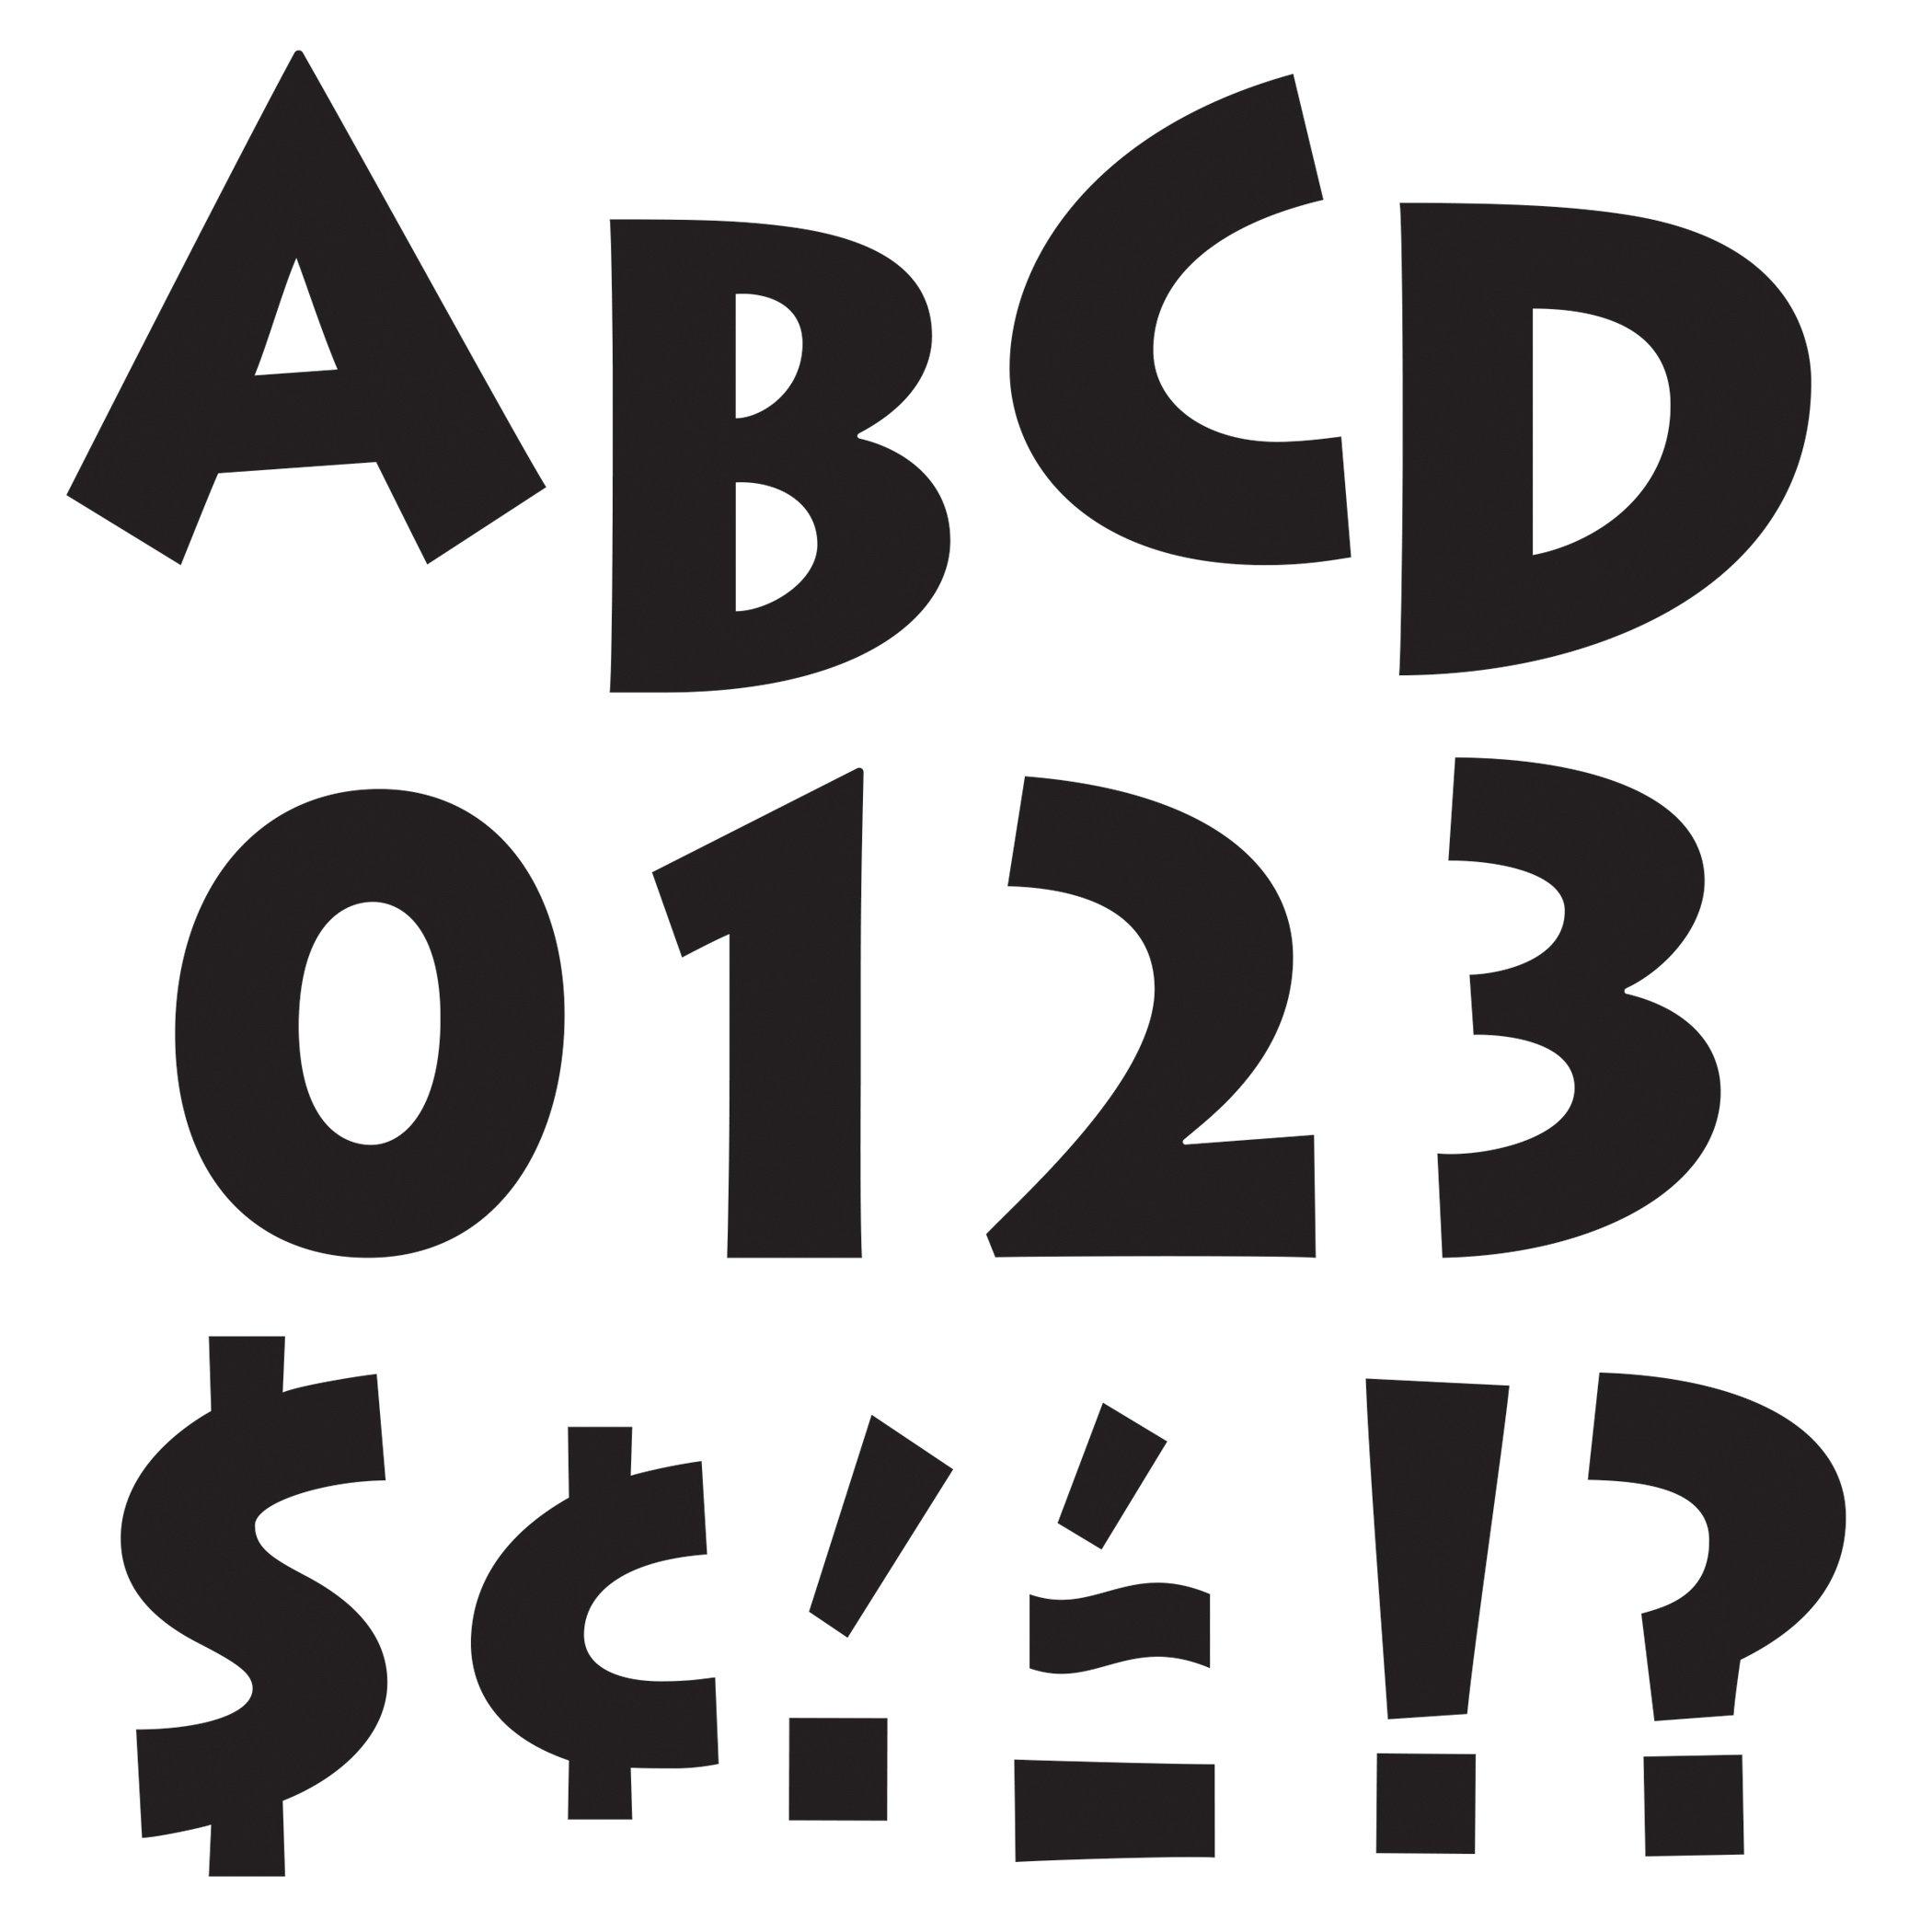 Trend Enterprises T-79201BN Black 4'' Venture Uppercase Ready Letters, 6 Packs by TREND Enterprises (Image #1)